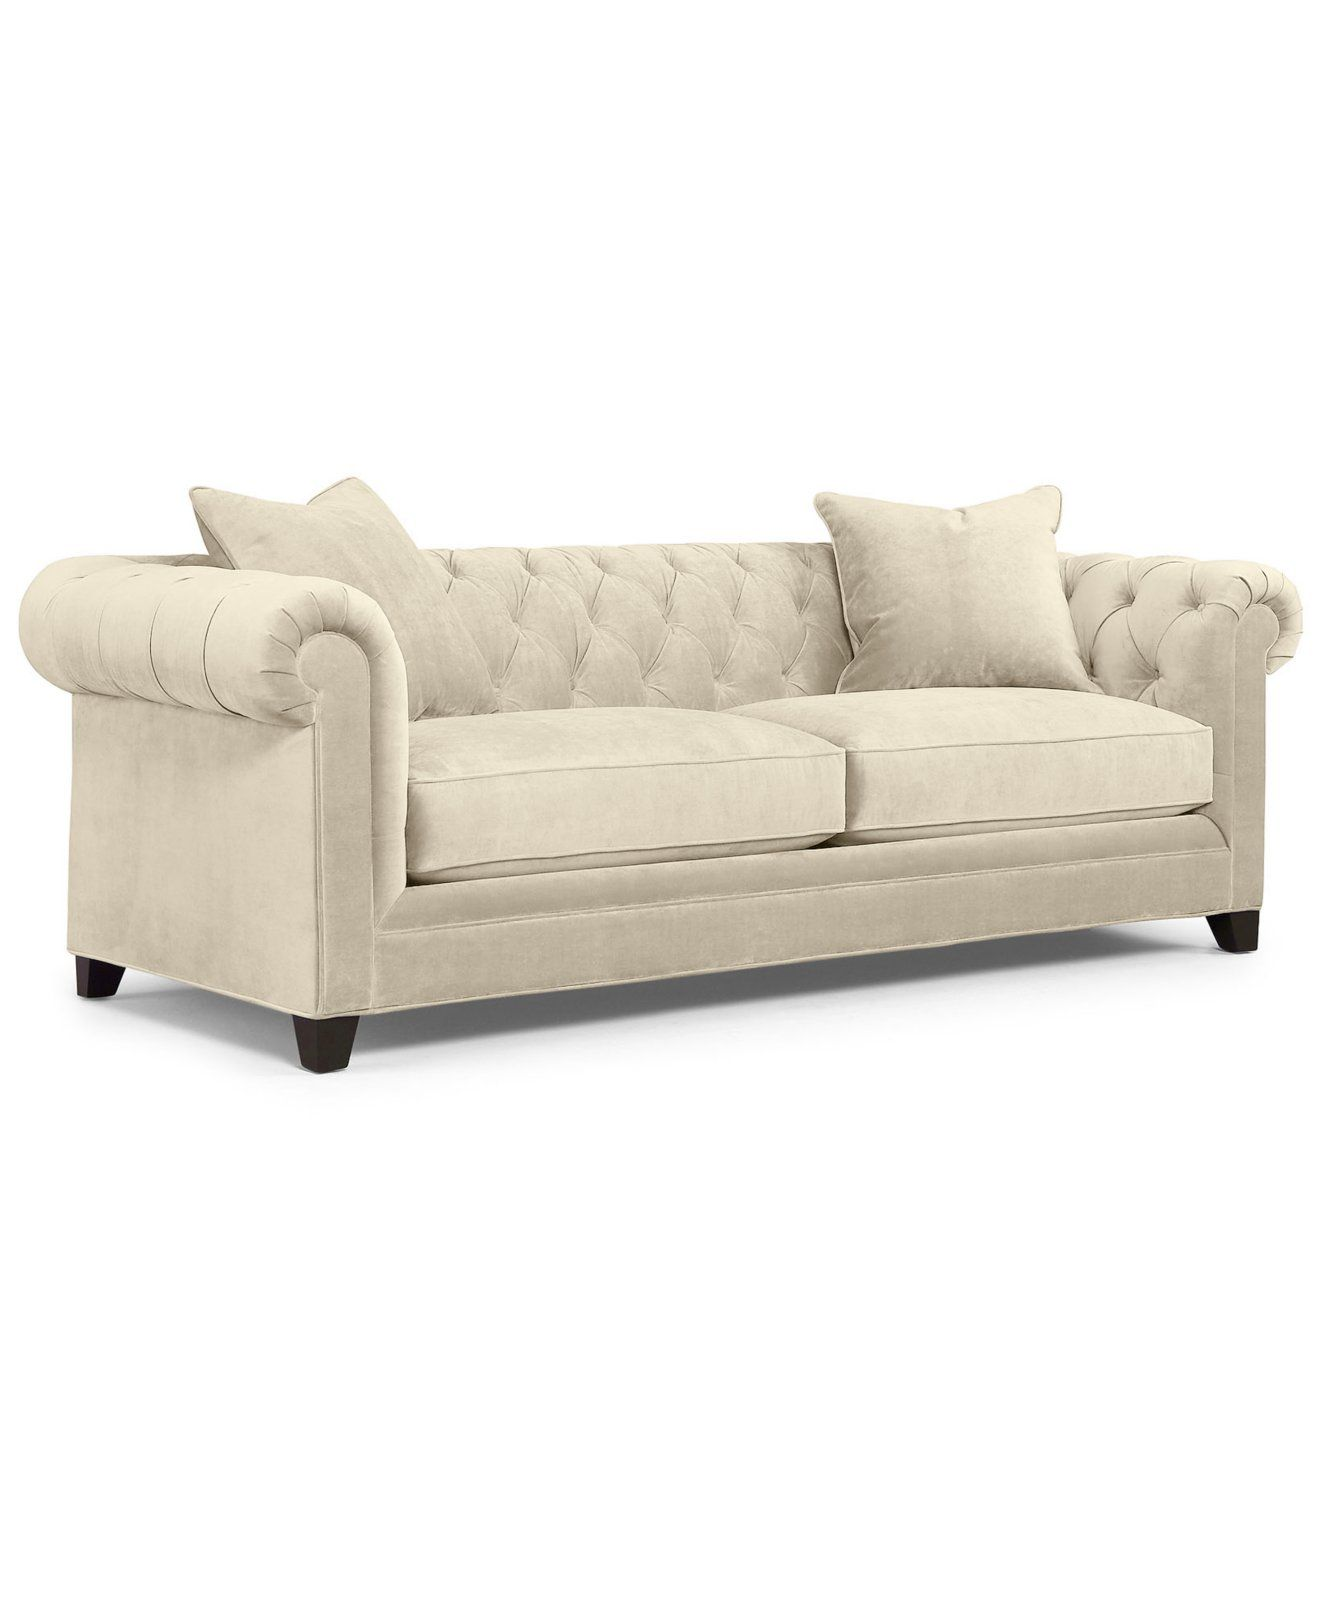 martha stewart saybridge sofa 3 seater cover online collection furniture